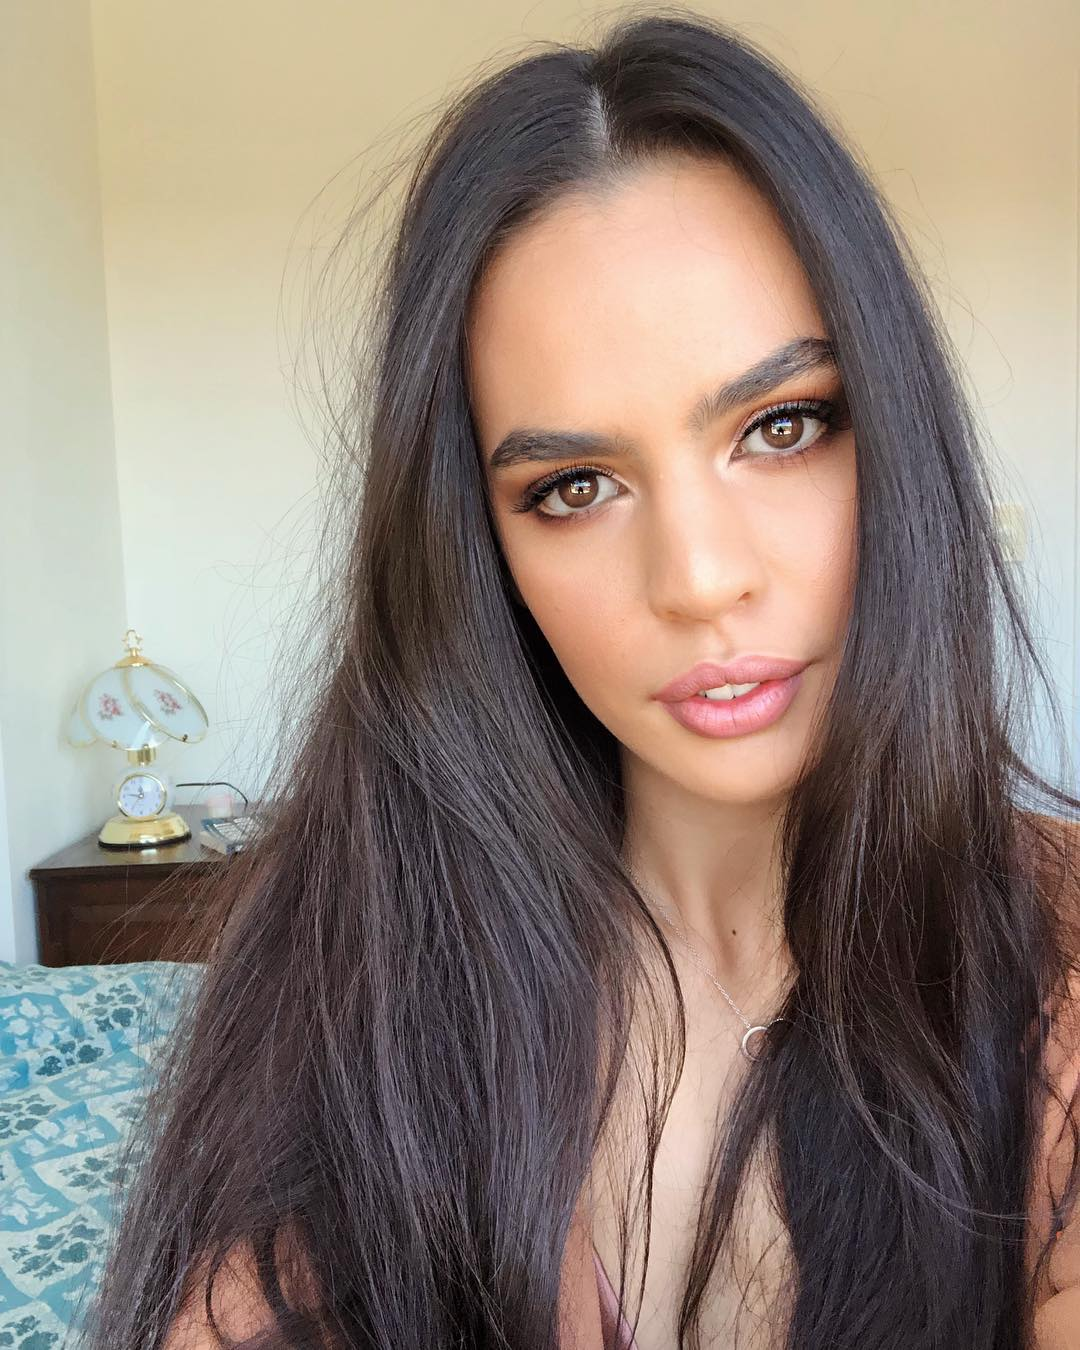 candidatas a miss world australia 2018. final: 31 agosto. - Página 6 Vp2gaxns